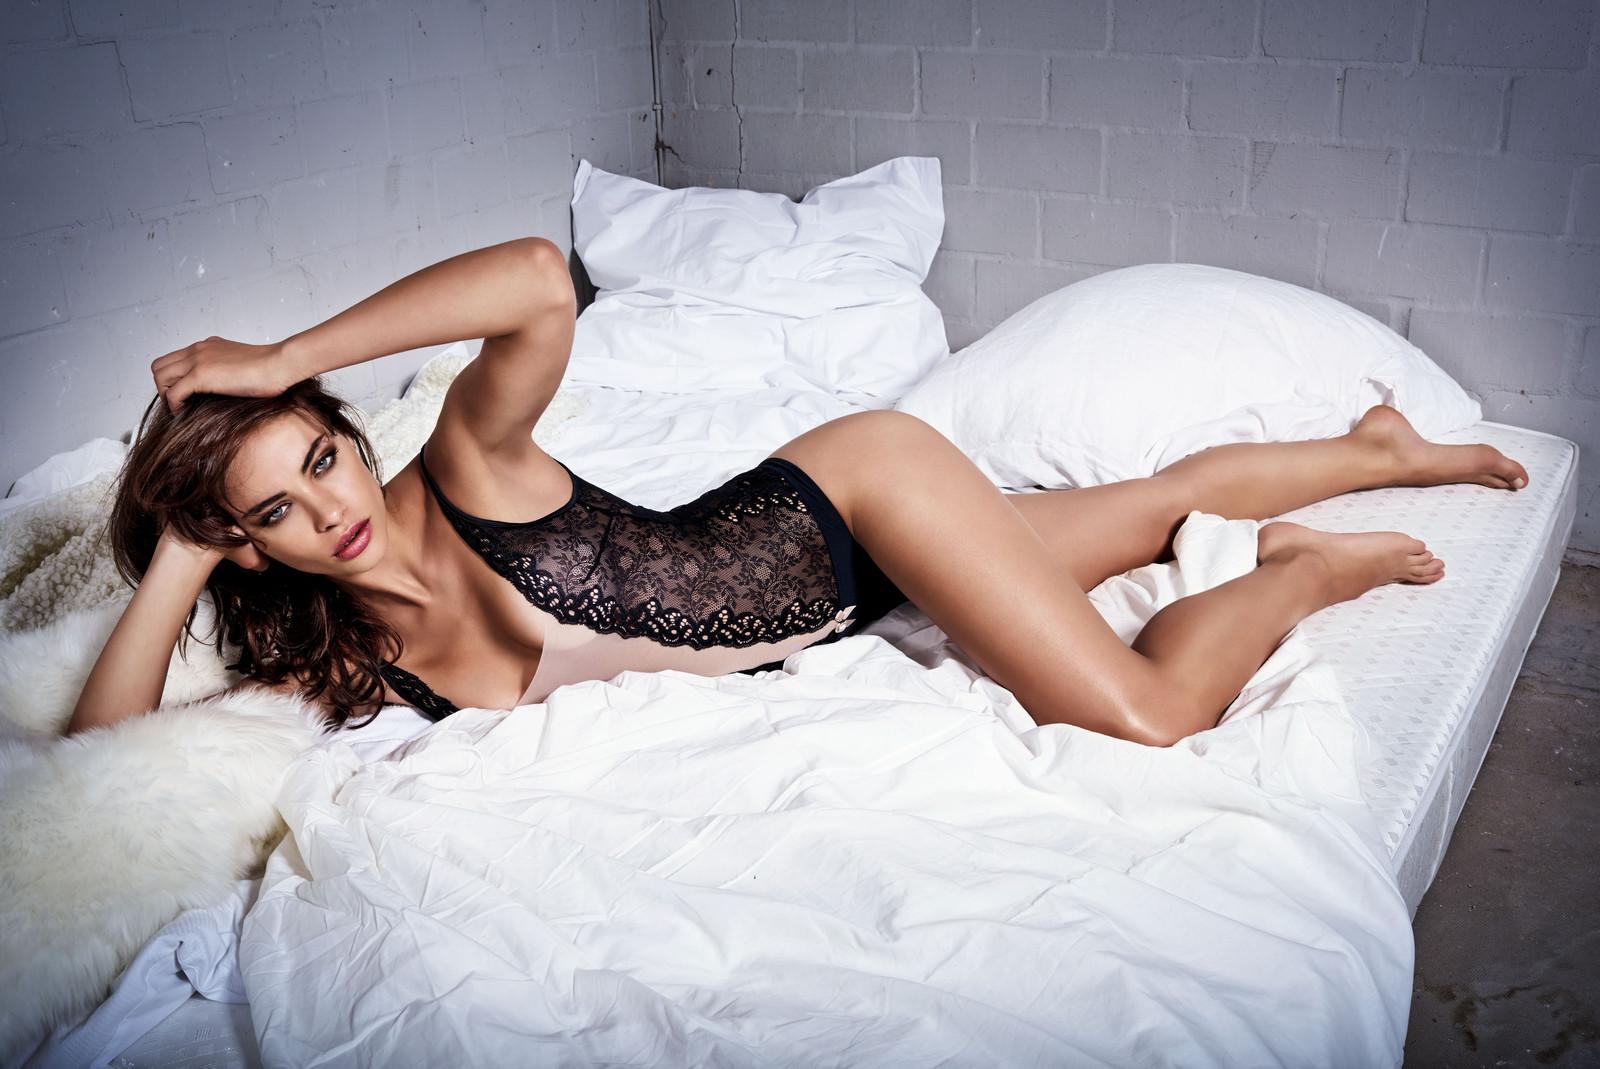 Nicole Meyer sexy pics (2)